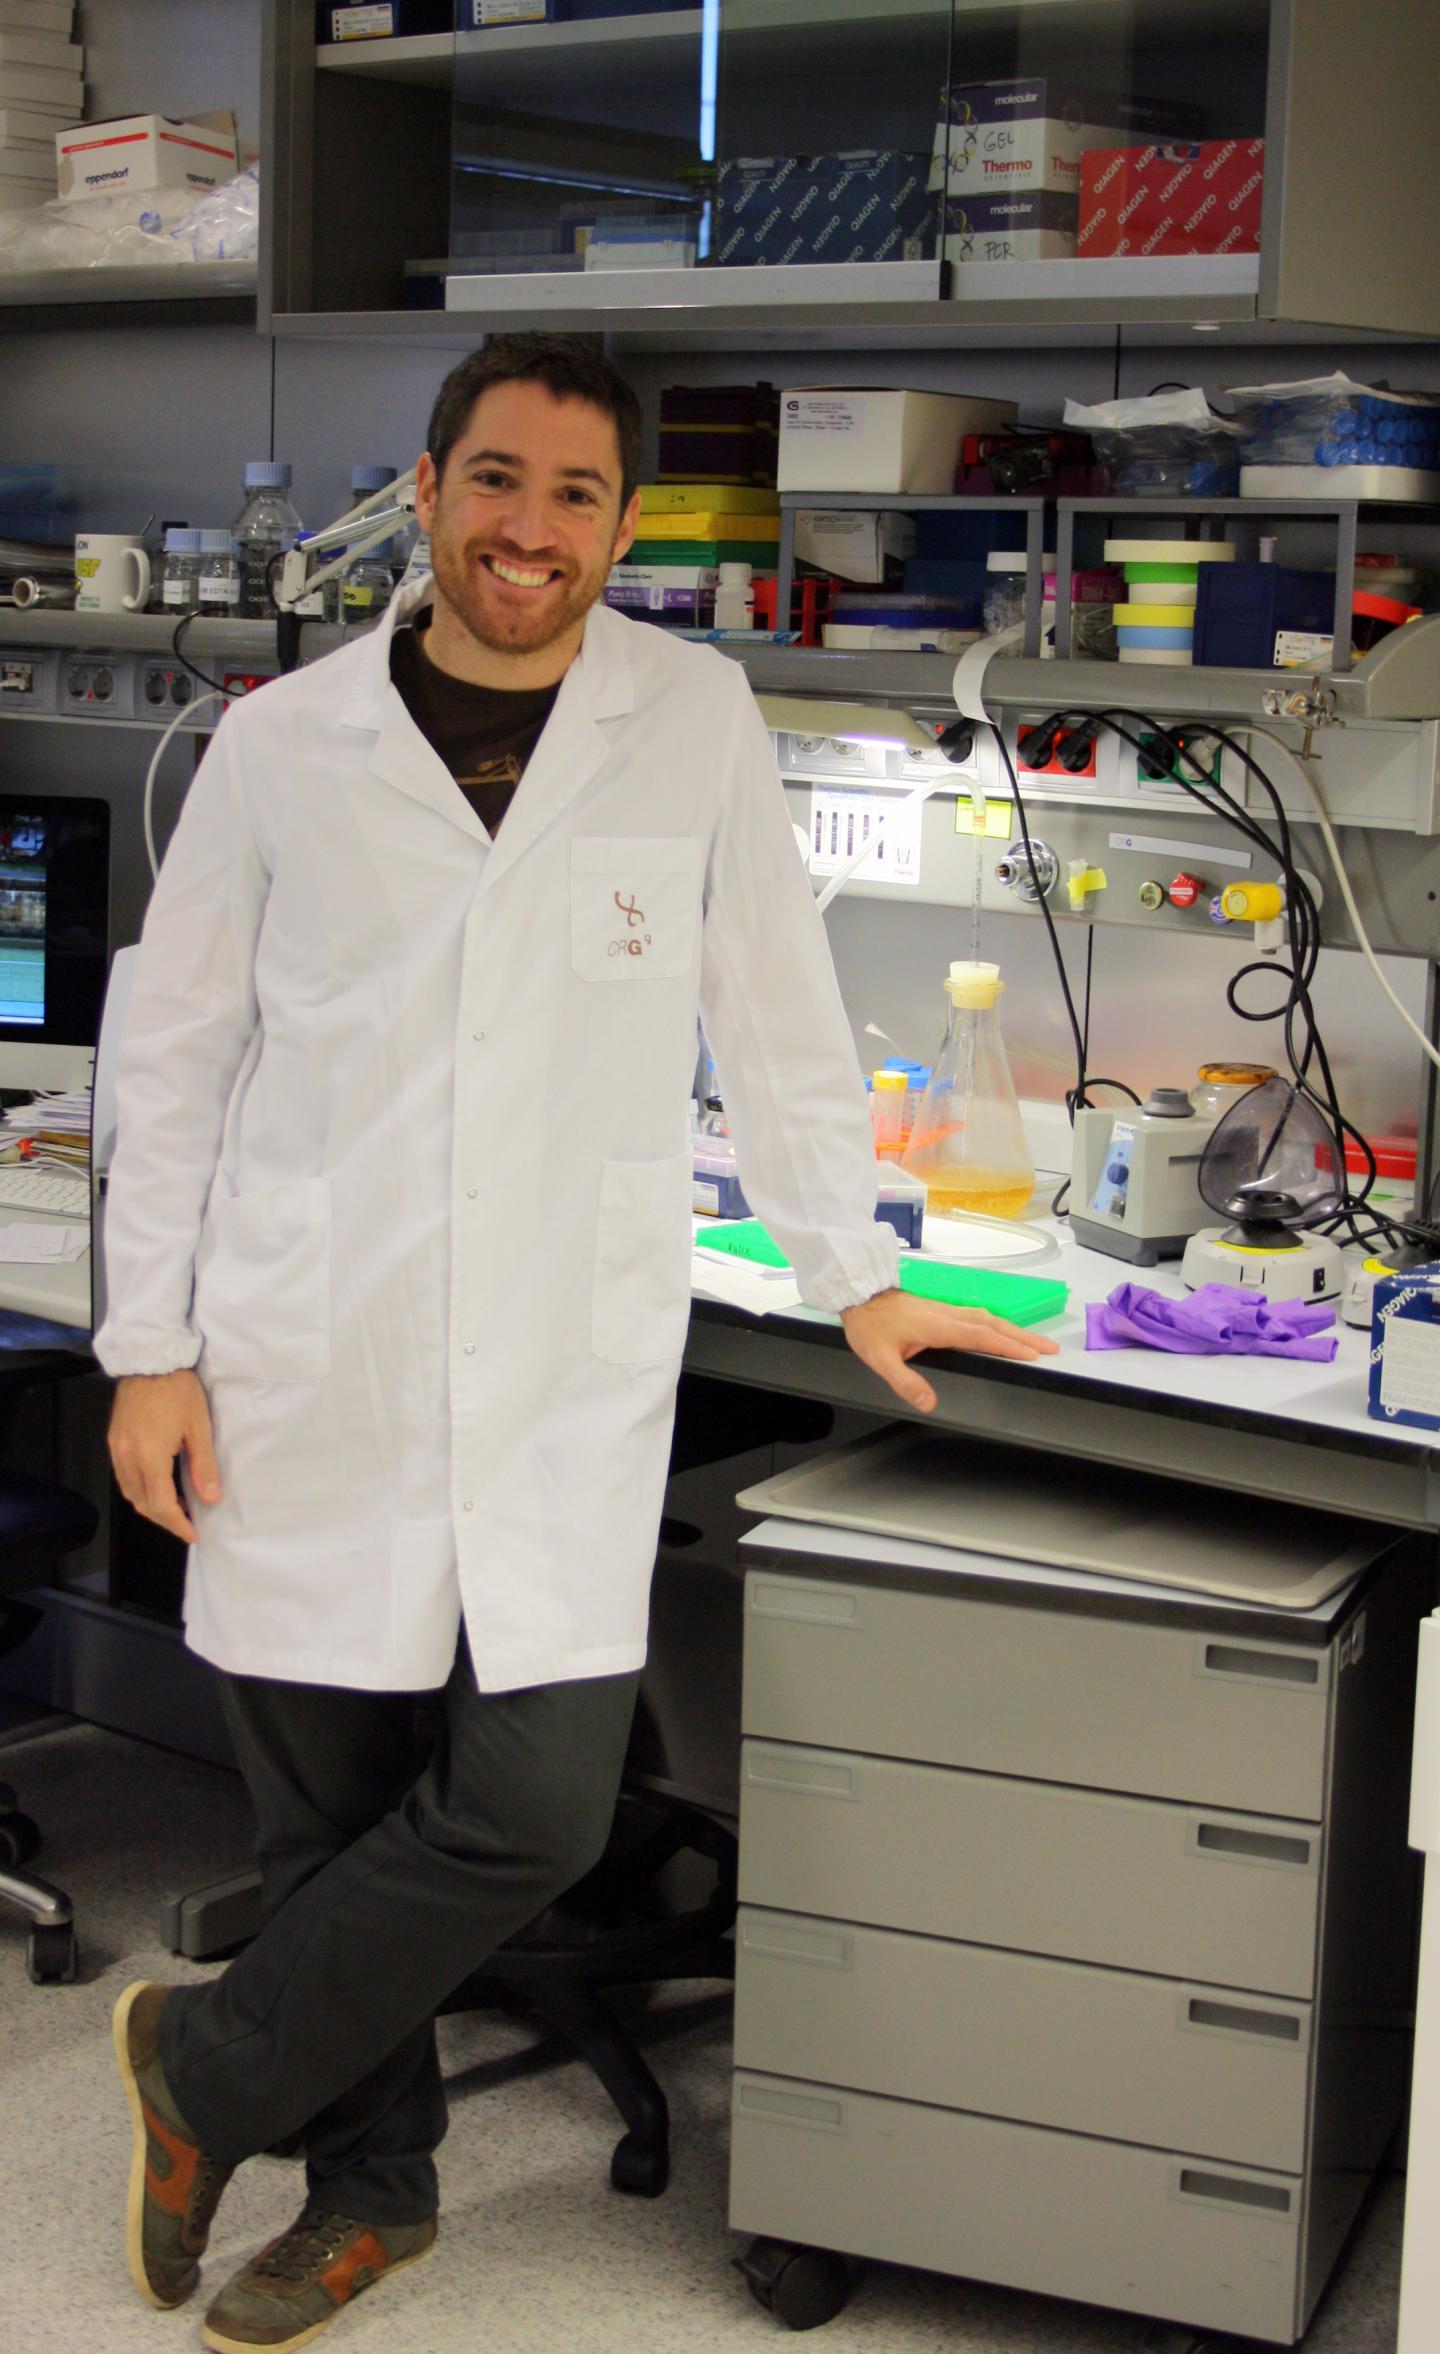 Manuel Irimia, Center for Genomic Regulation